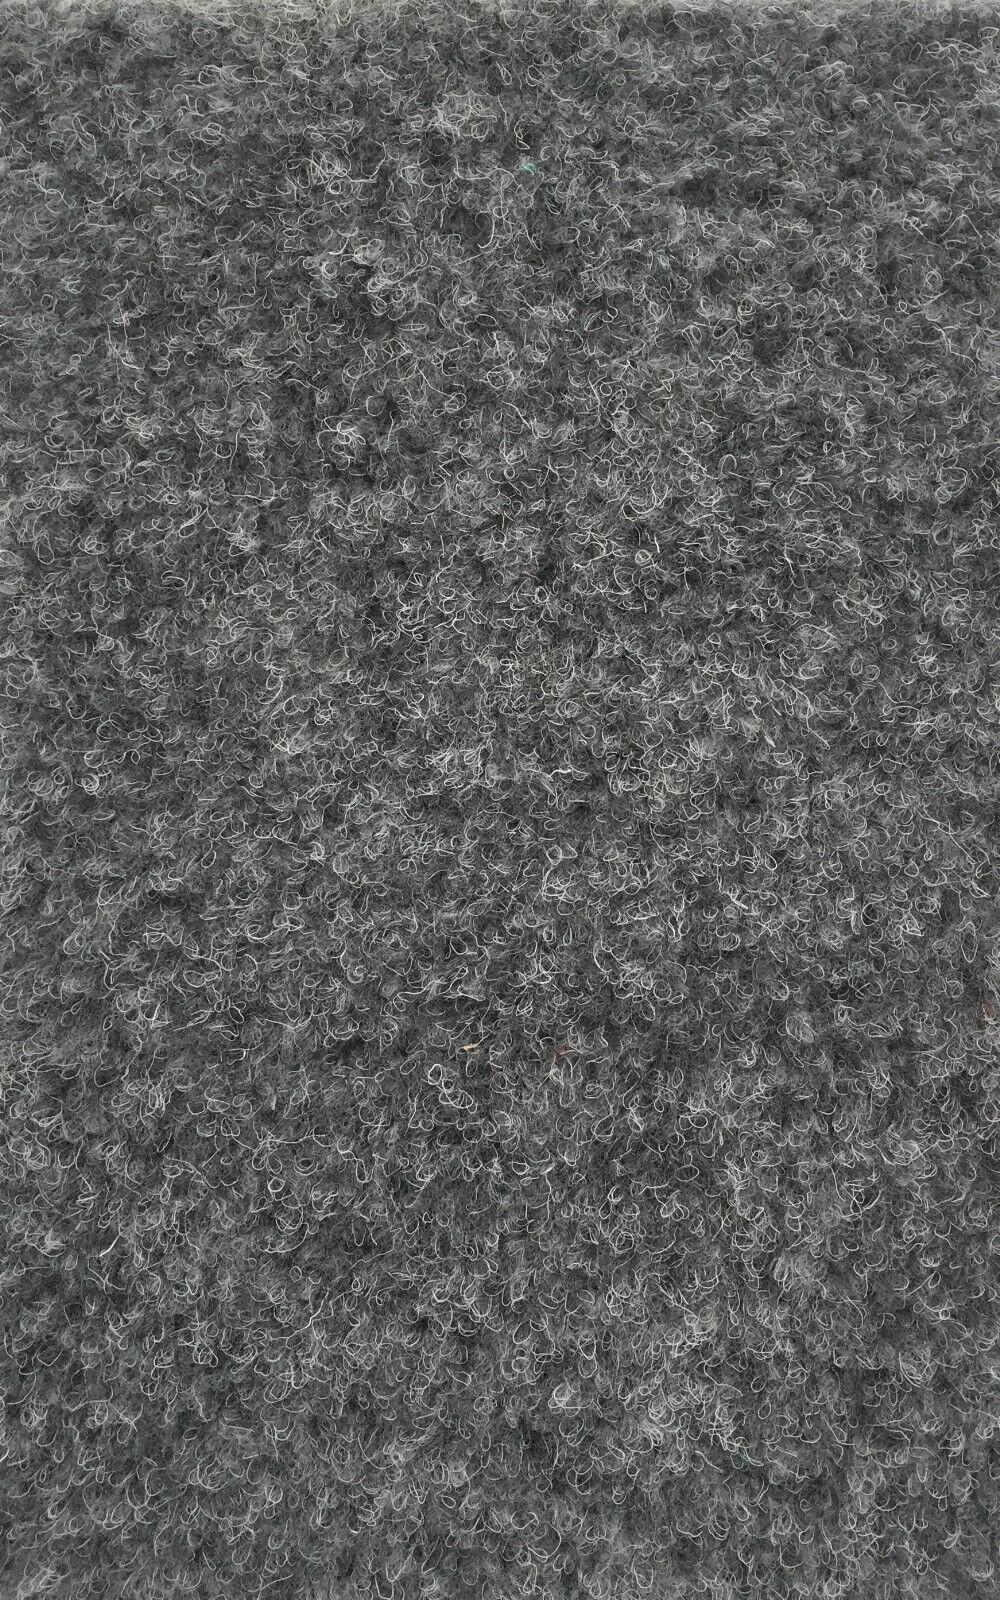 Kunstrasen Teppich Rasenteppich Vorzeltteppich m. Noppen Noppen Noppen Bodenbelag 200 cm breit 38a548